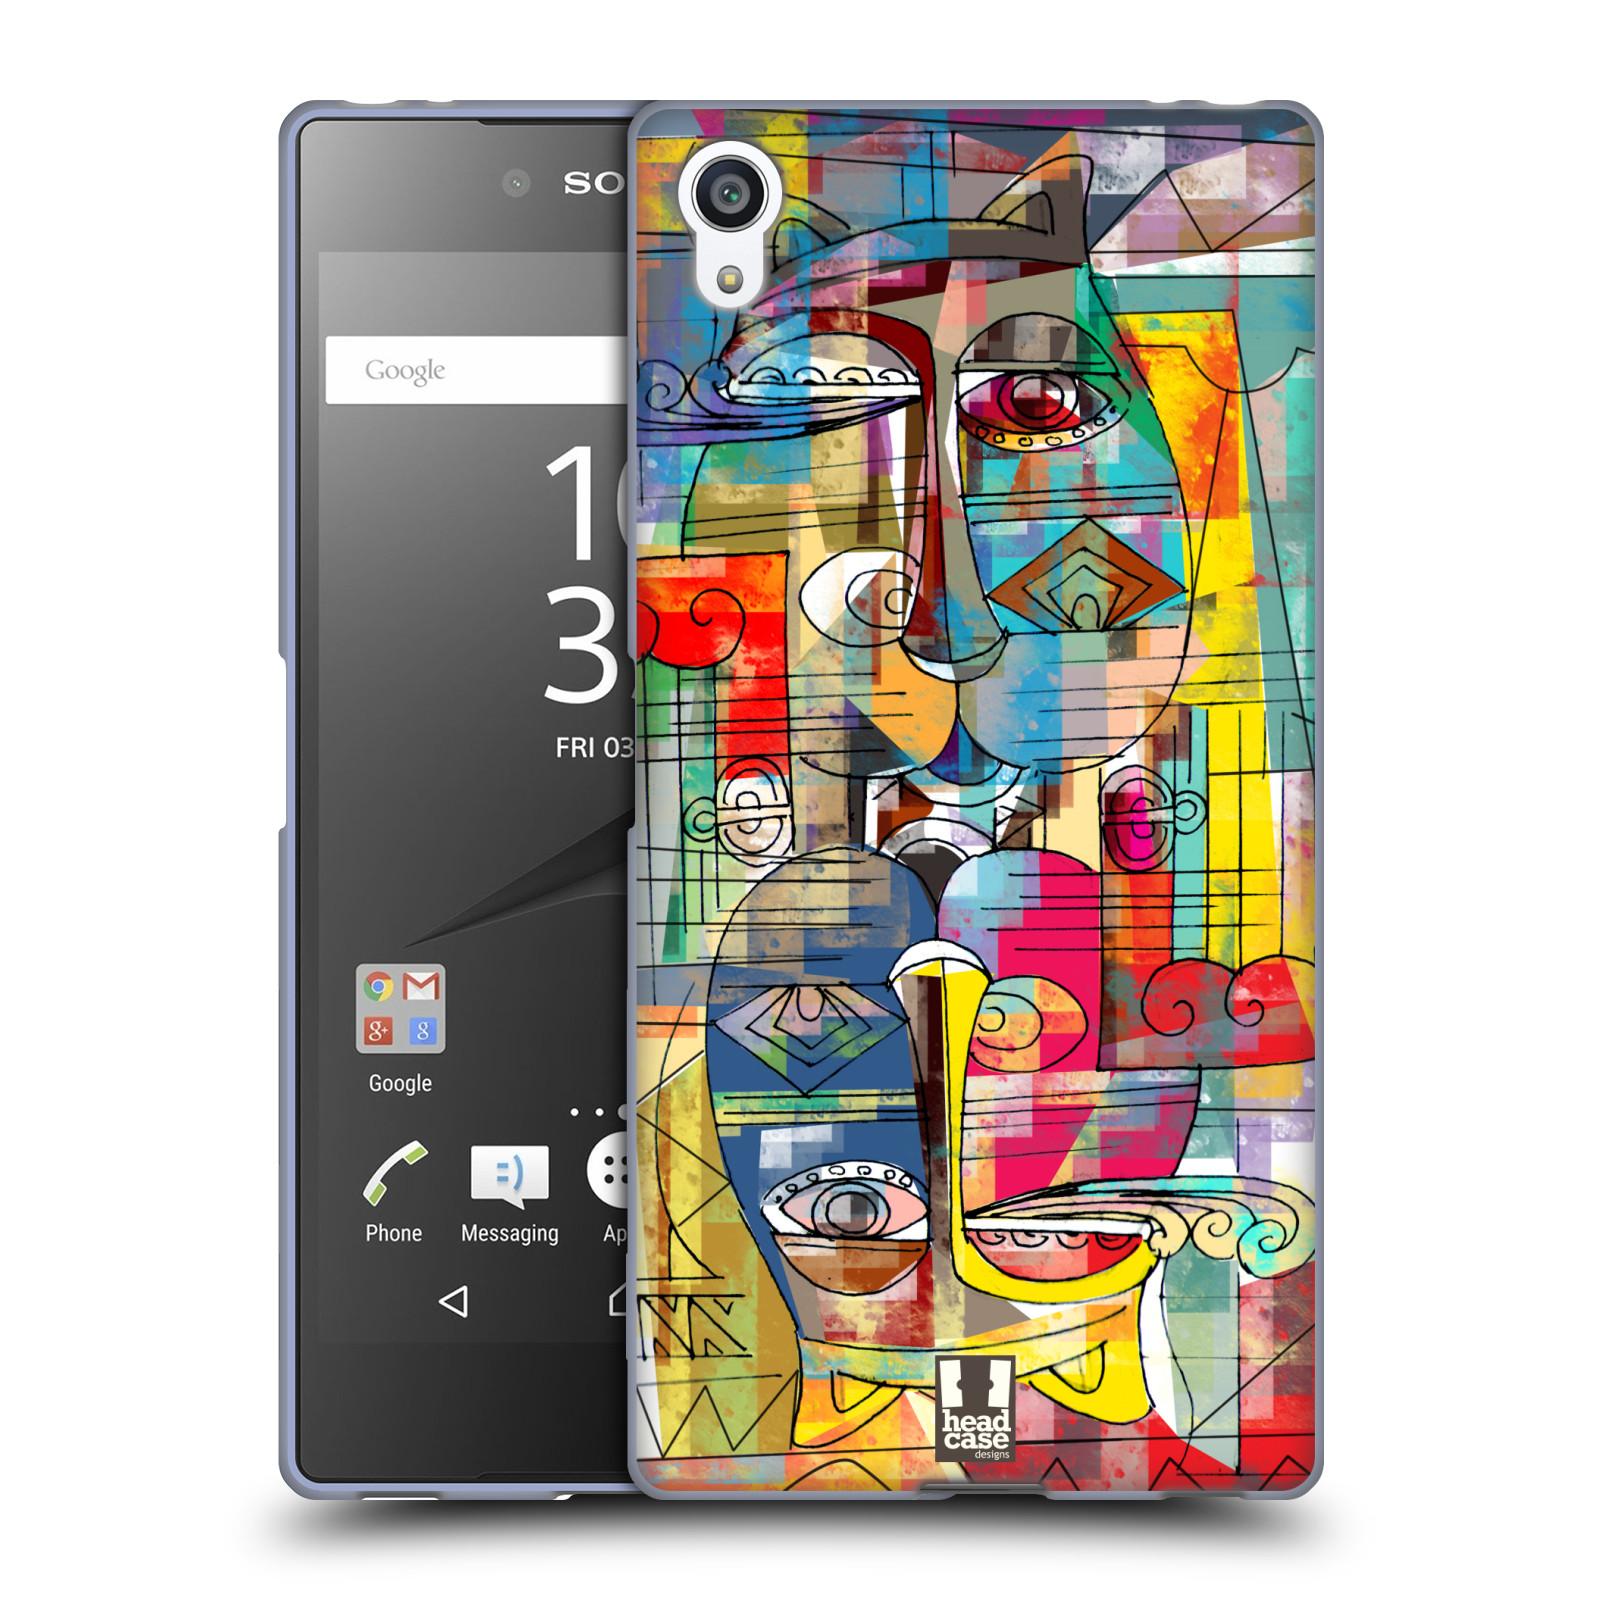 Silikonové pouzdro na mobil Sony Xperia Z5 Premium HEAD CASE AZTEC MANX